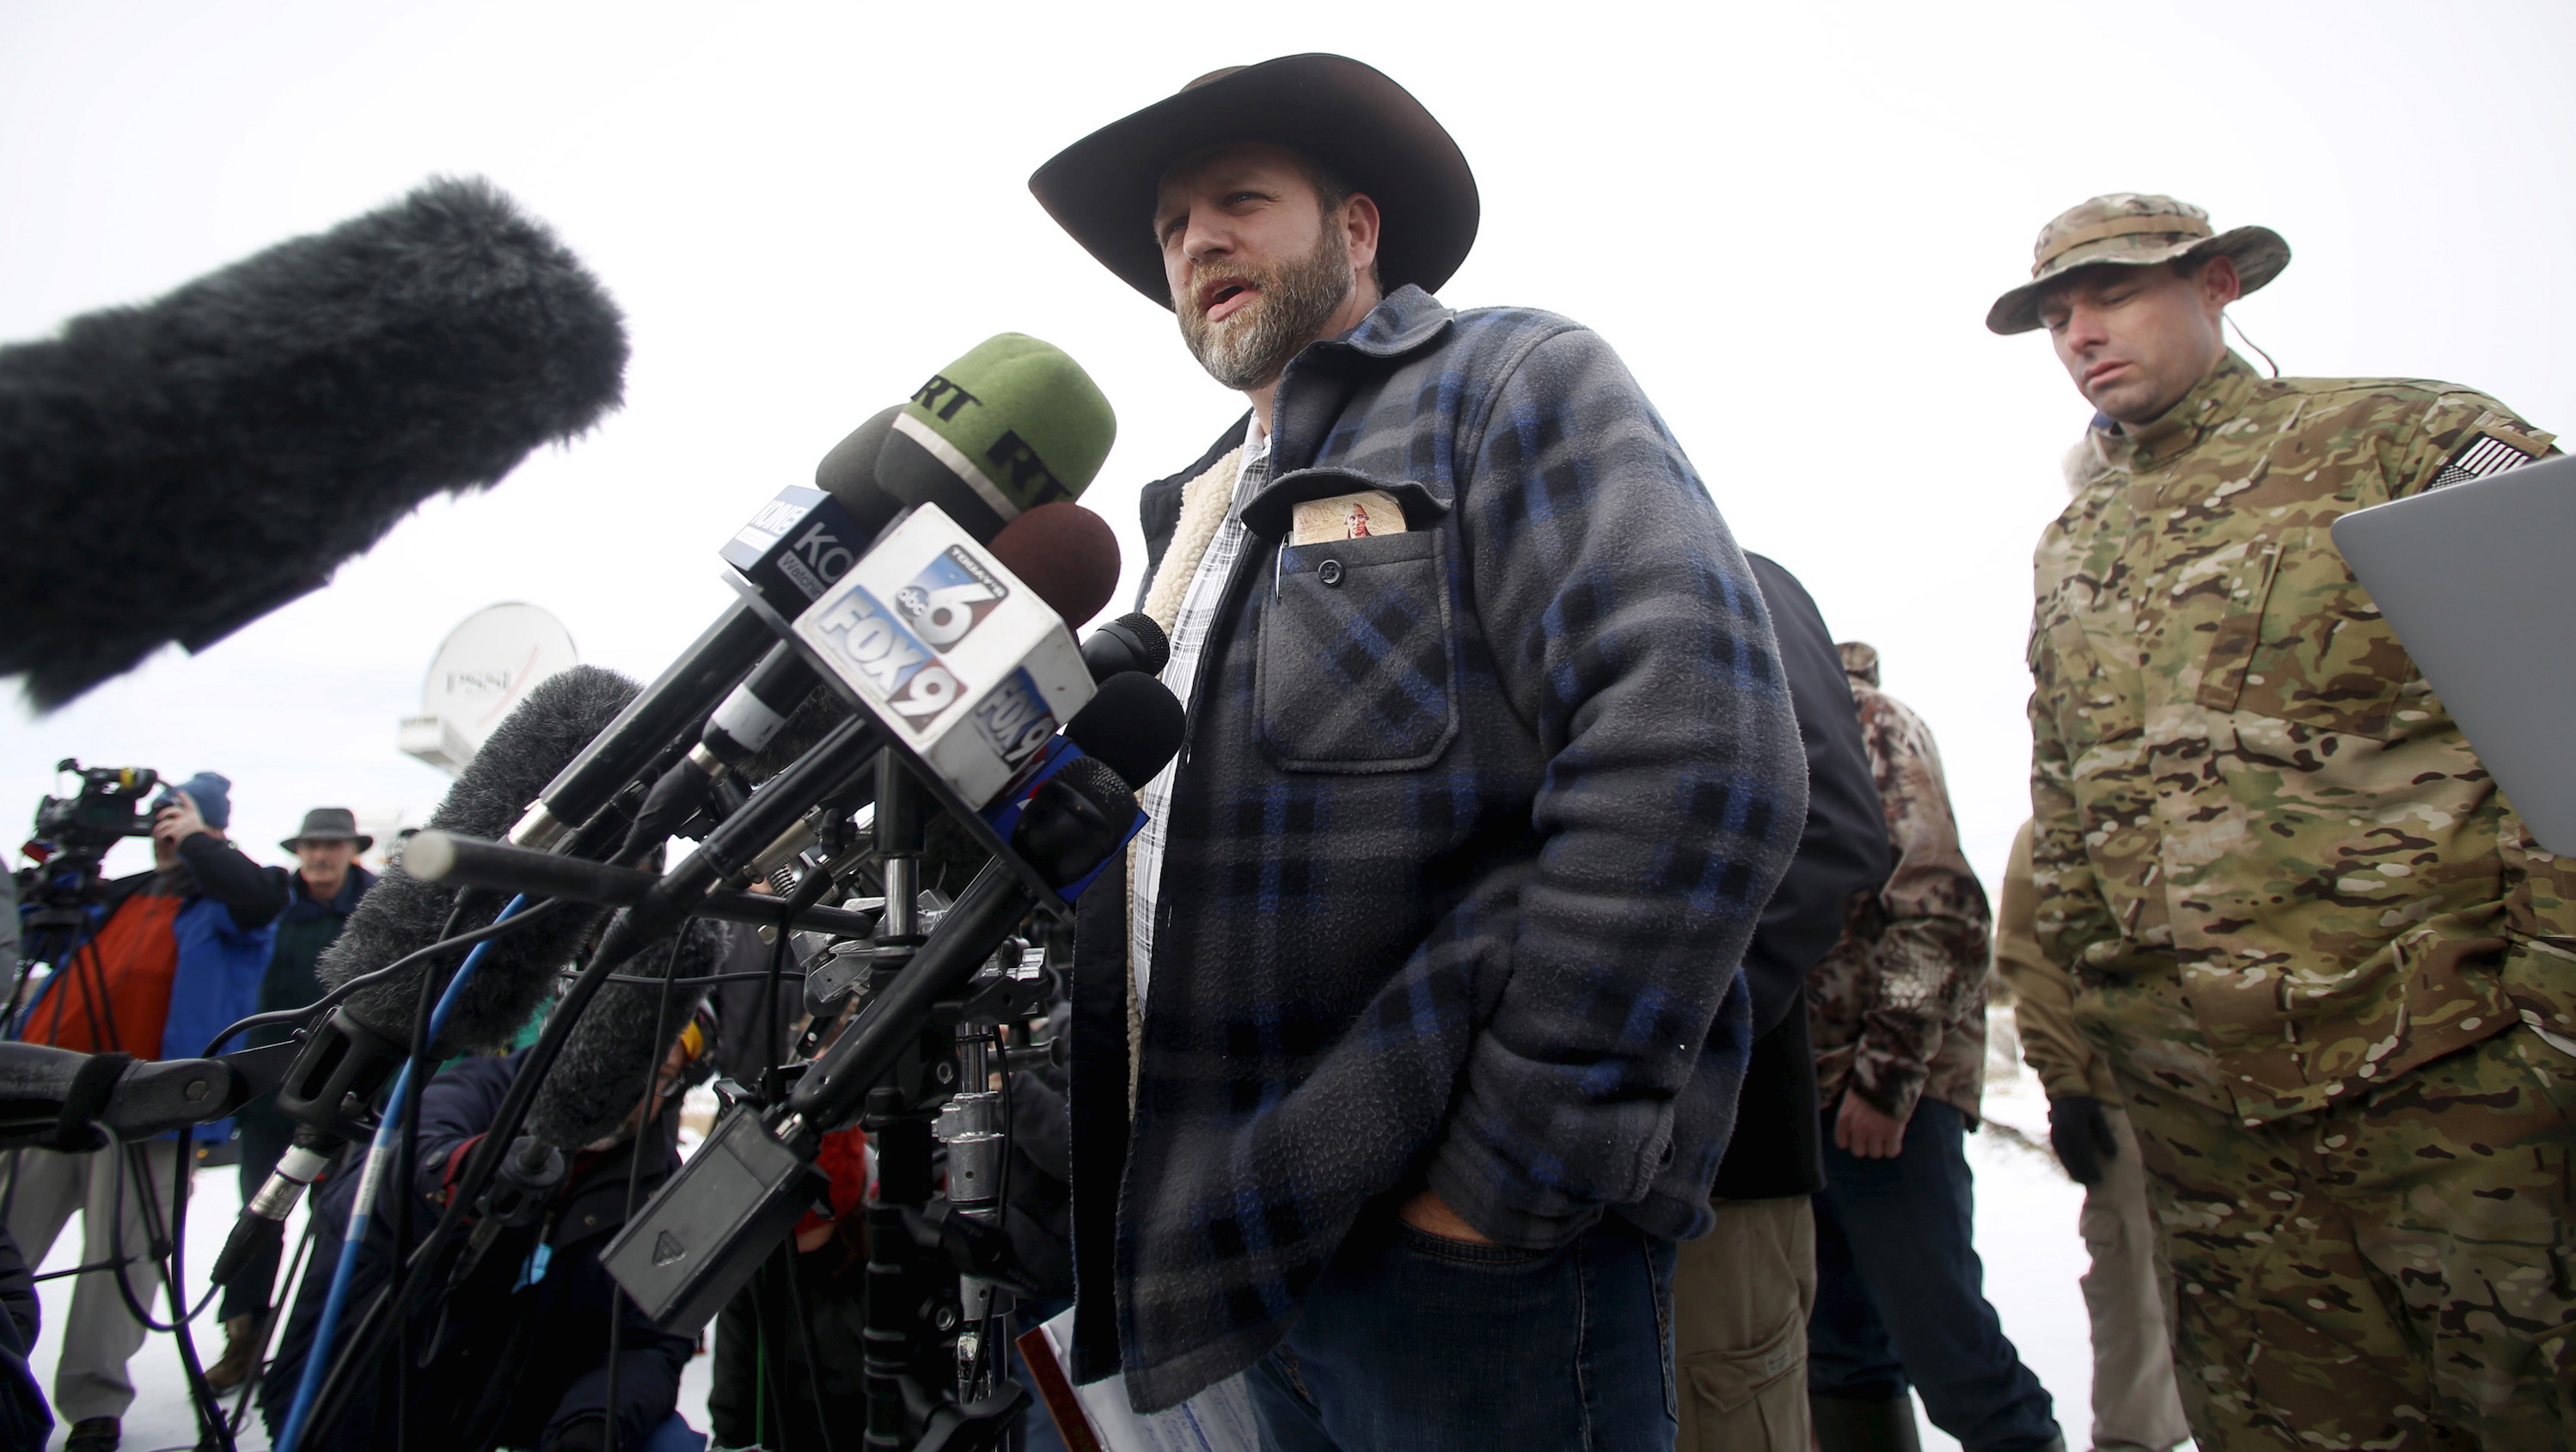 Ammon Bundy addresses the media at the Malheur National Wildlife Refuge near Burns